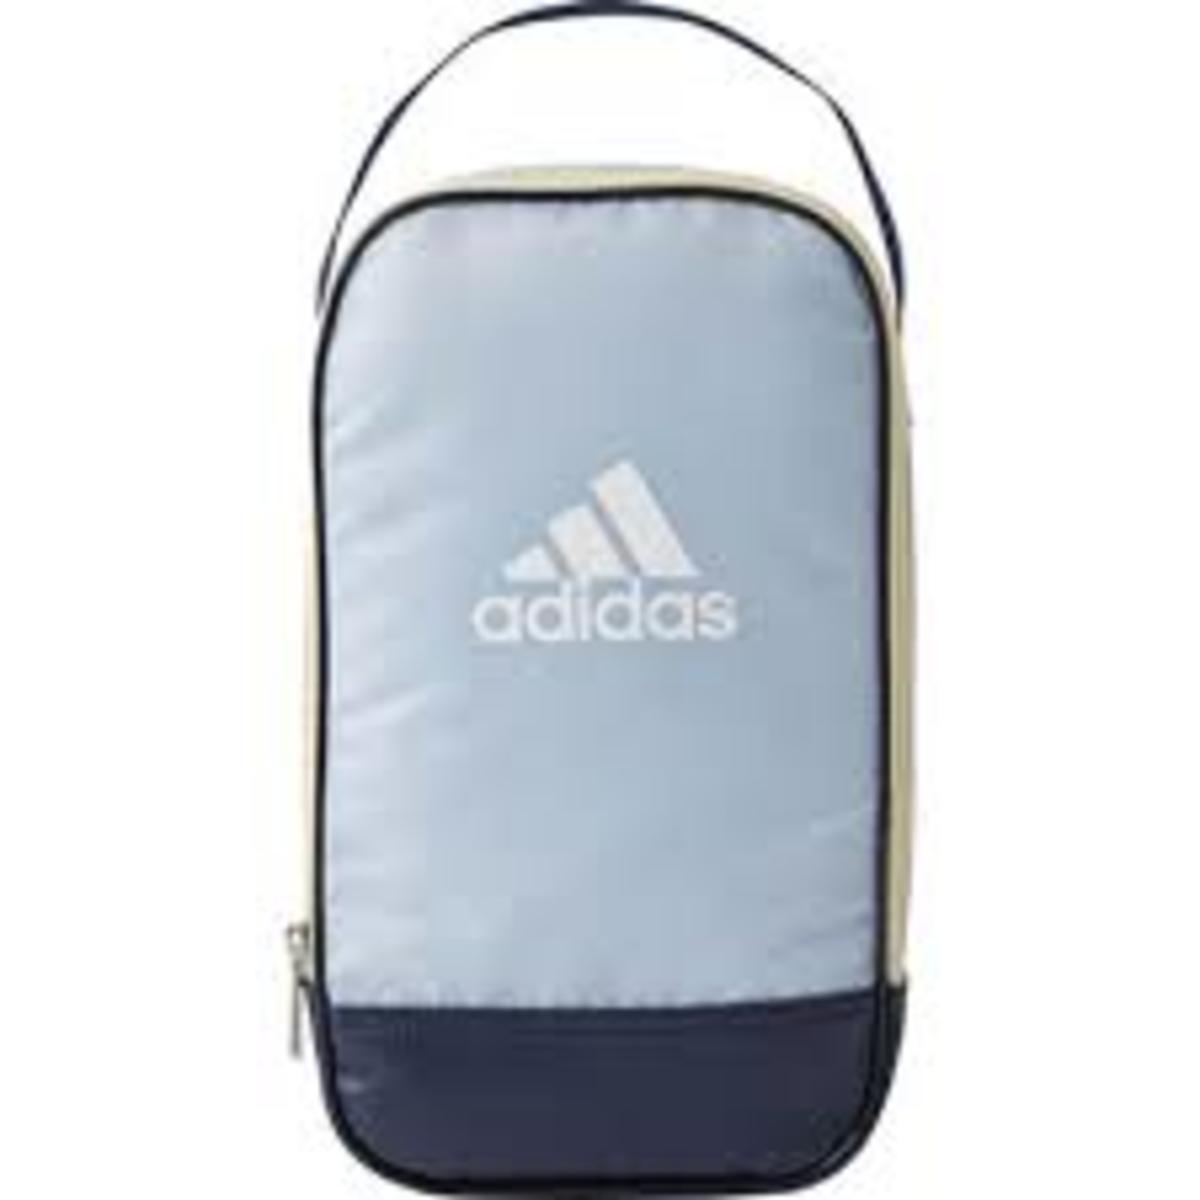 ccff730b4958 (Light Blue) Japan Adidas Multi-function Sports Shoe Pouch